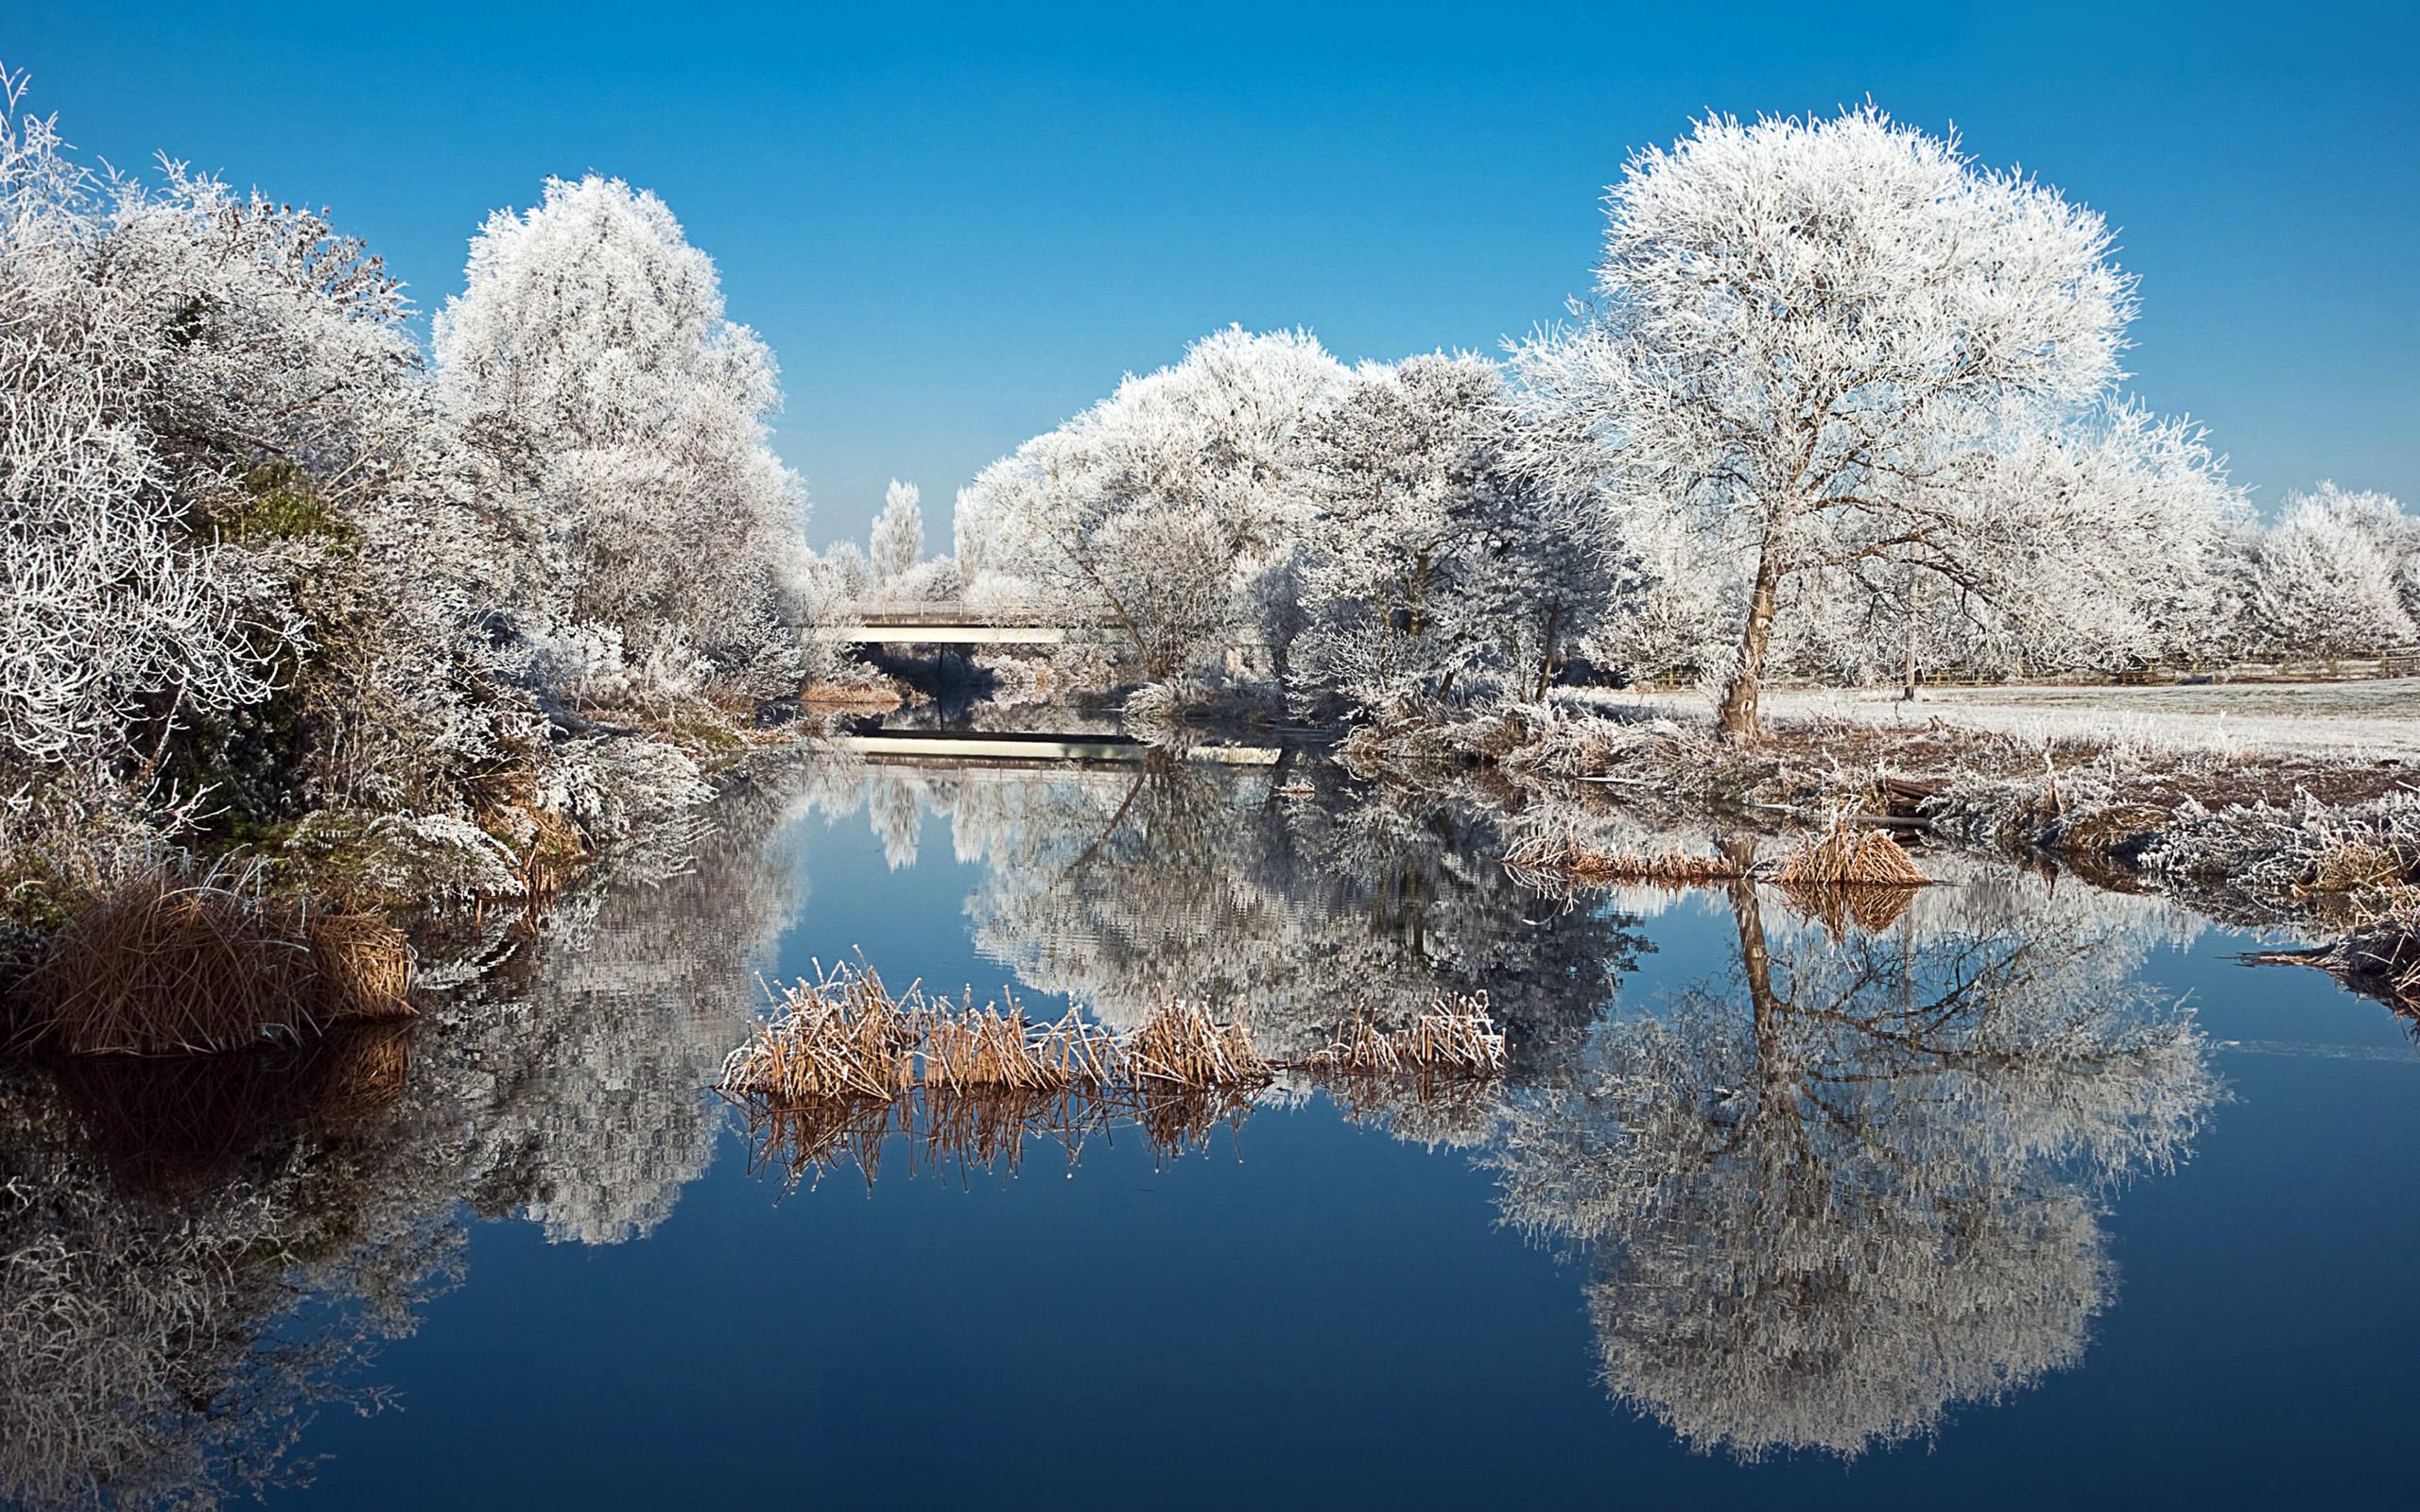 озеро зима иней the lake winter frost  № 580085 загрузить